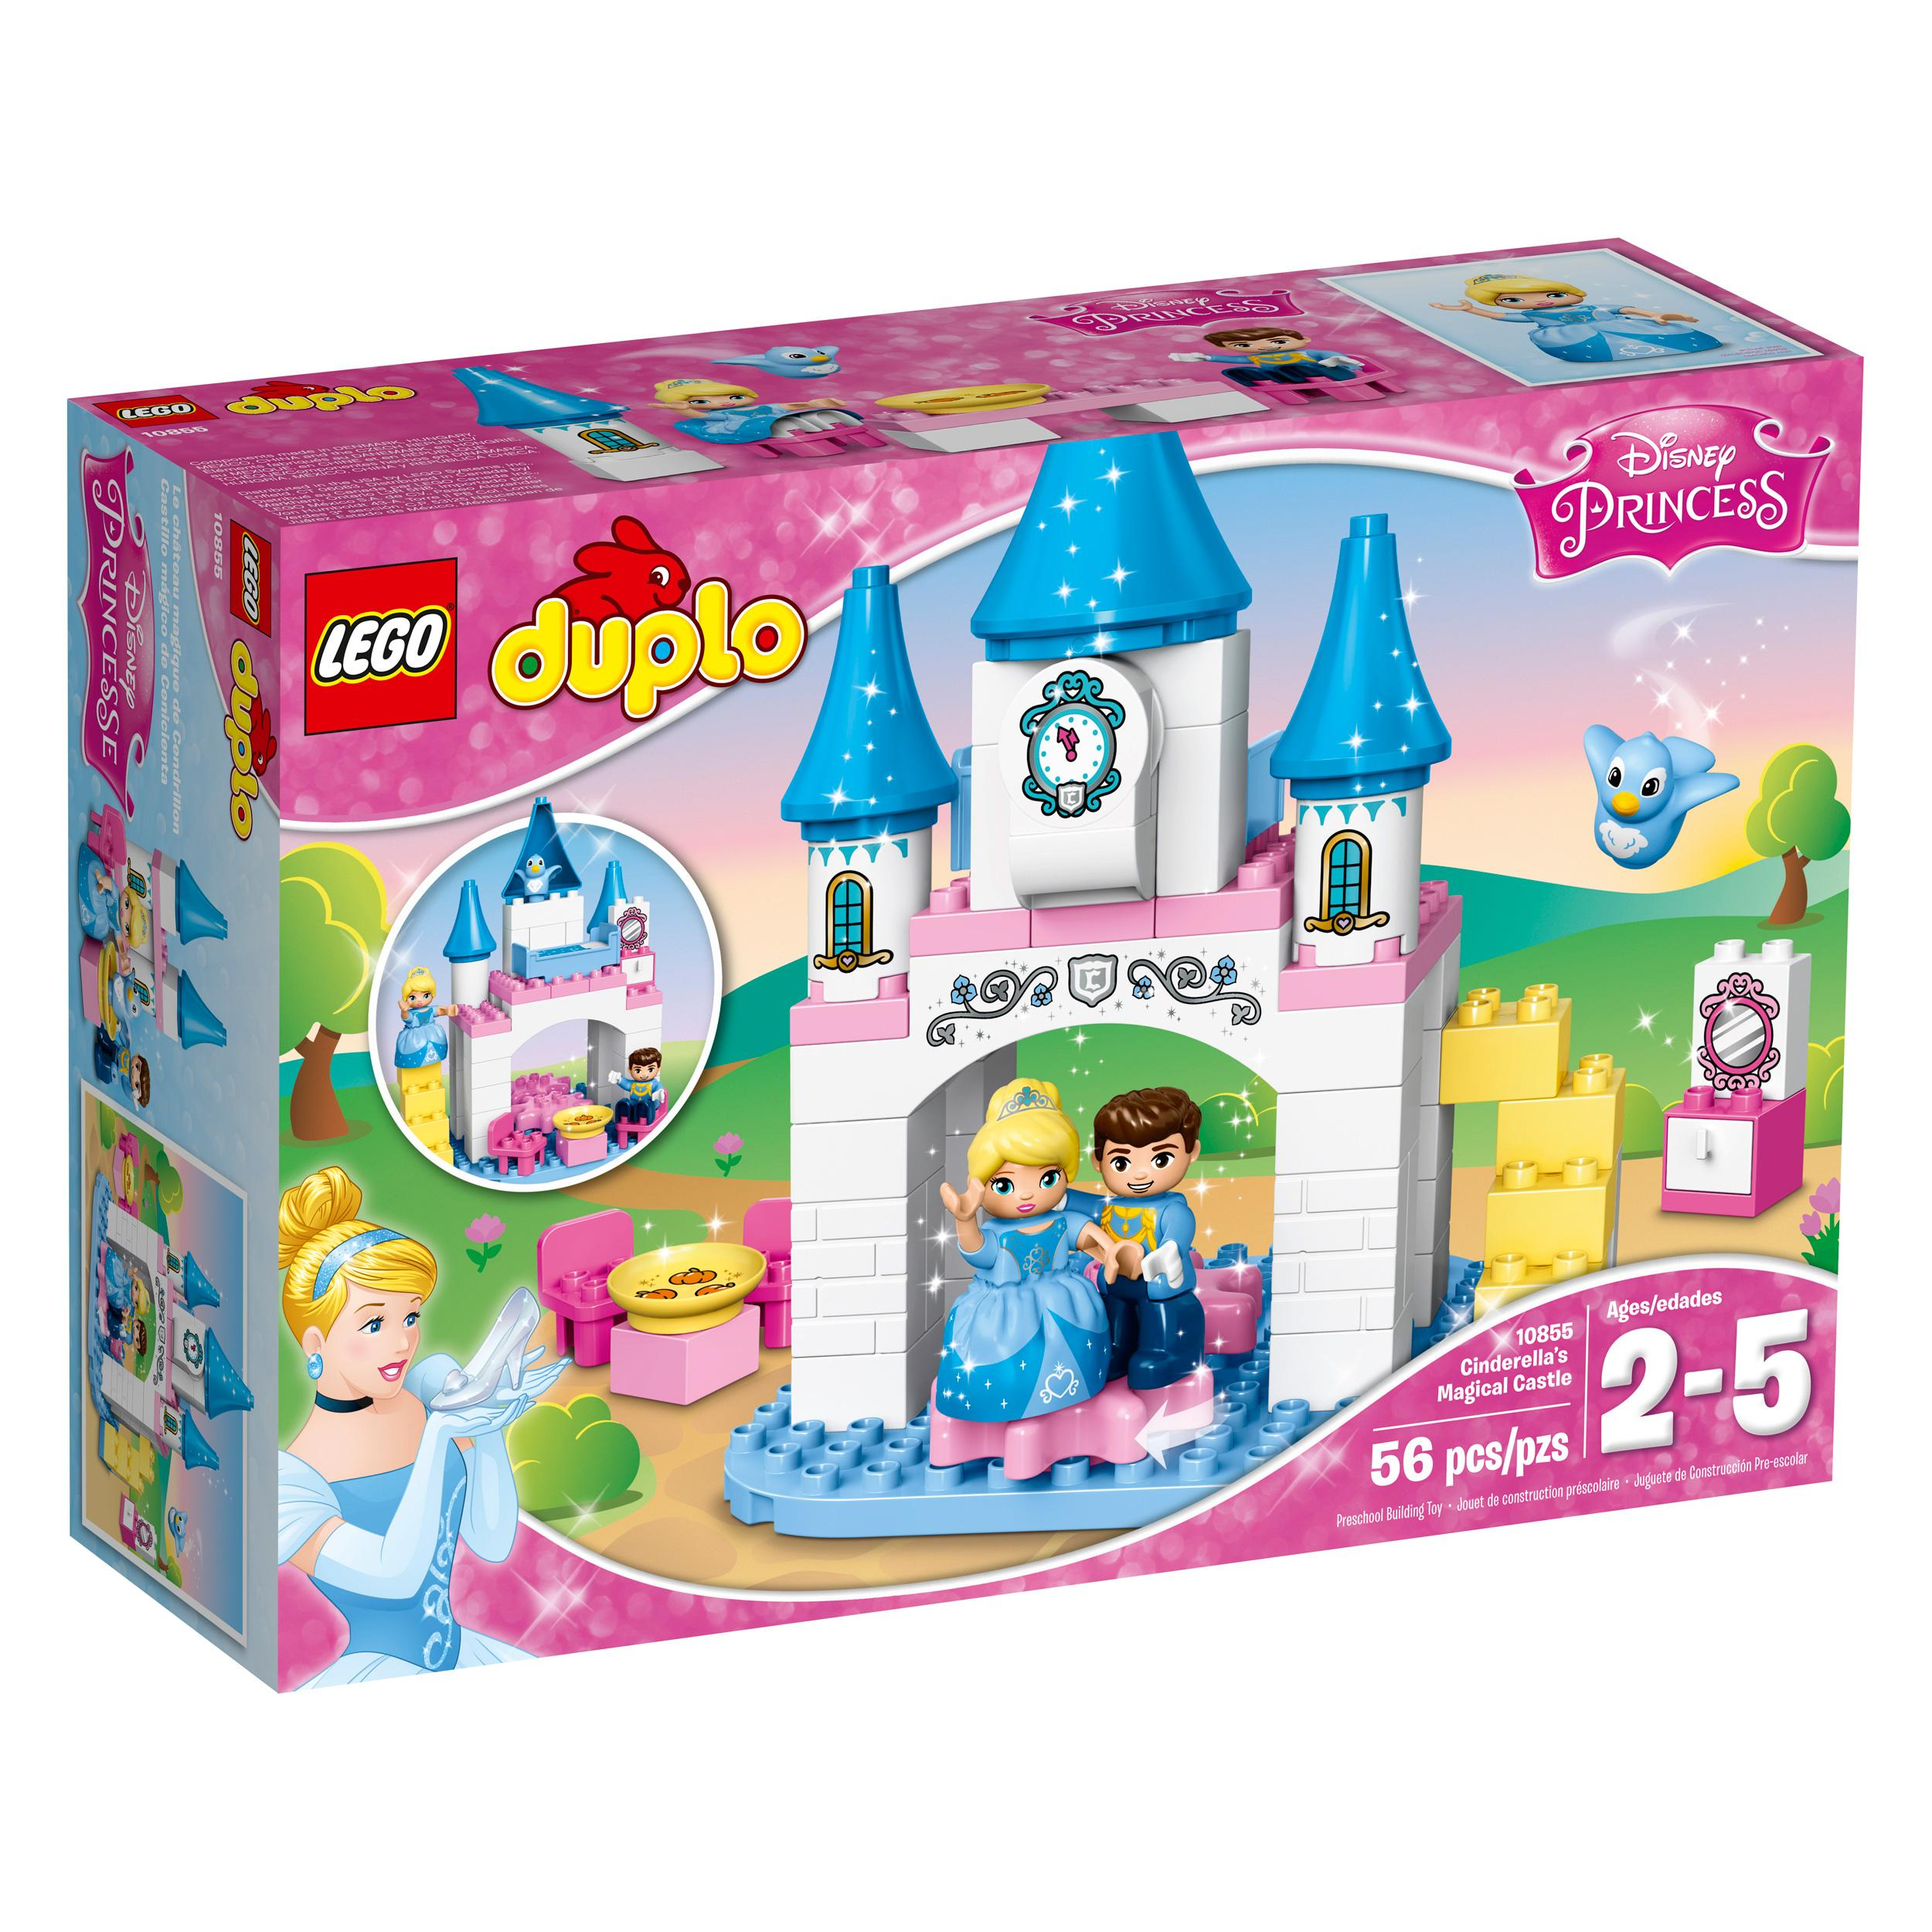 Cinderella S Magical Castle Building Set